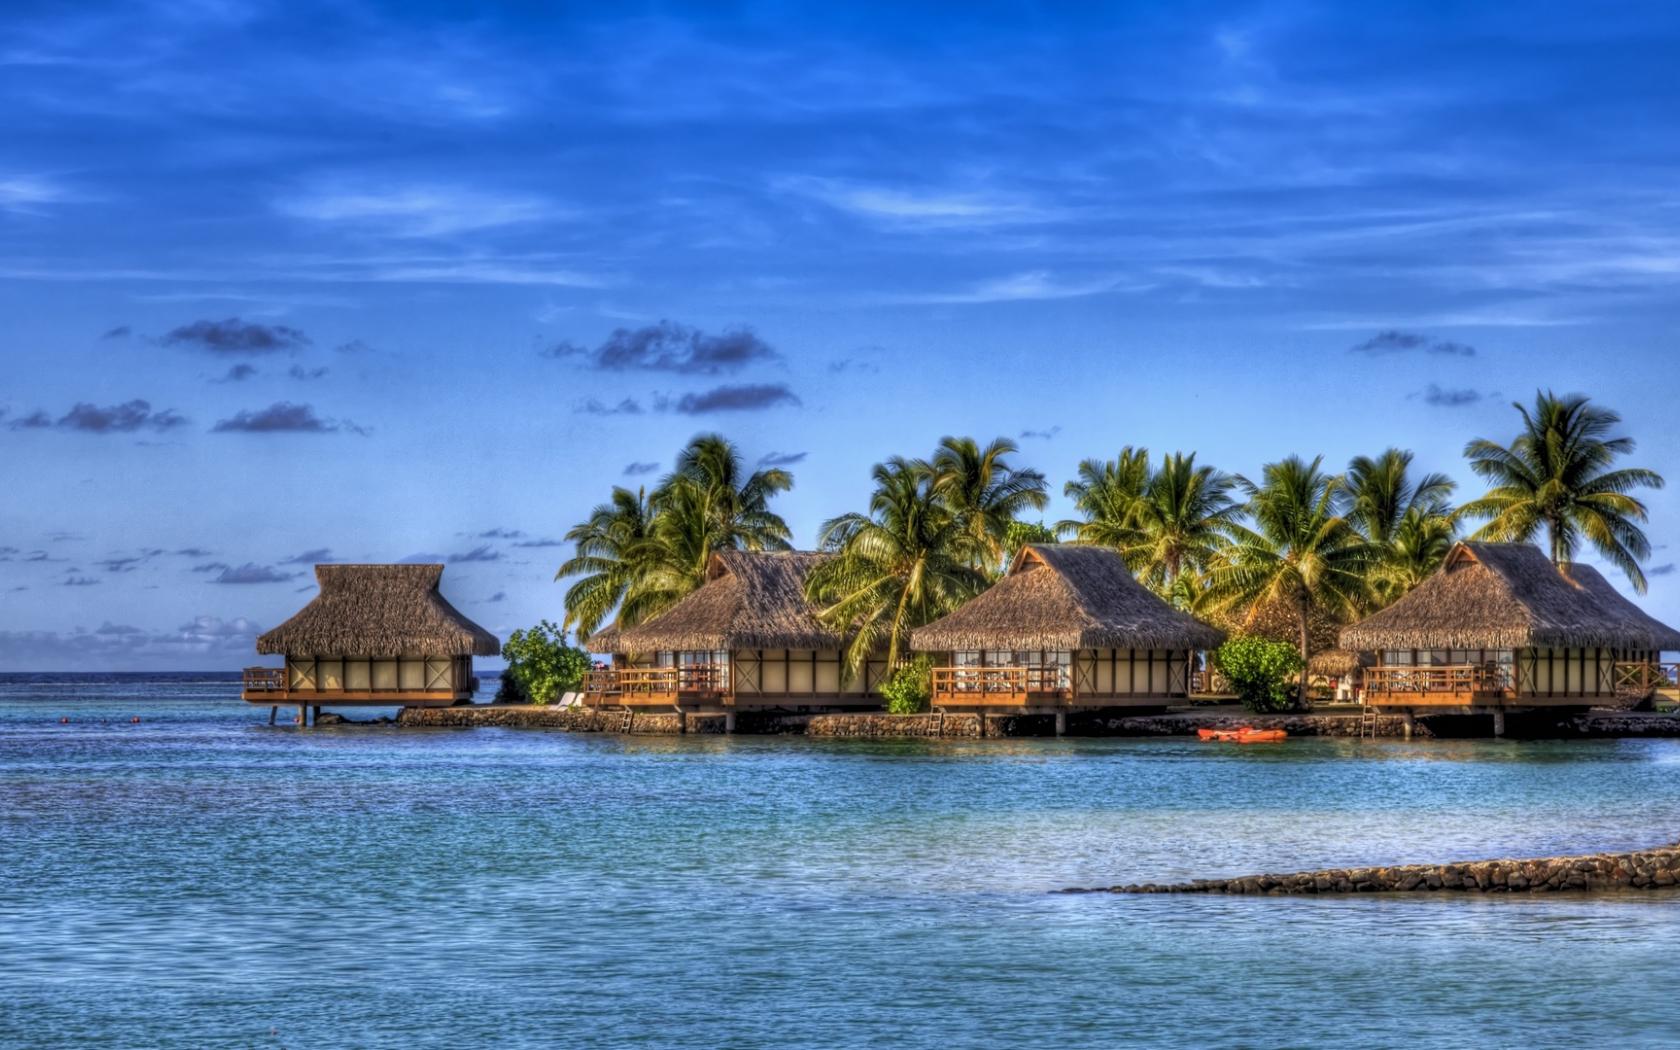 Free Download Maldives Island Hotel Hdr Full Hd Desktop